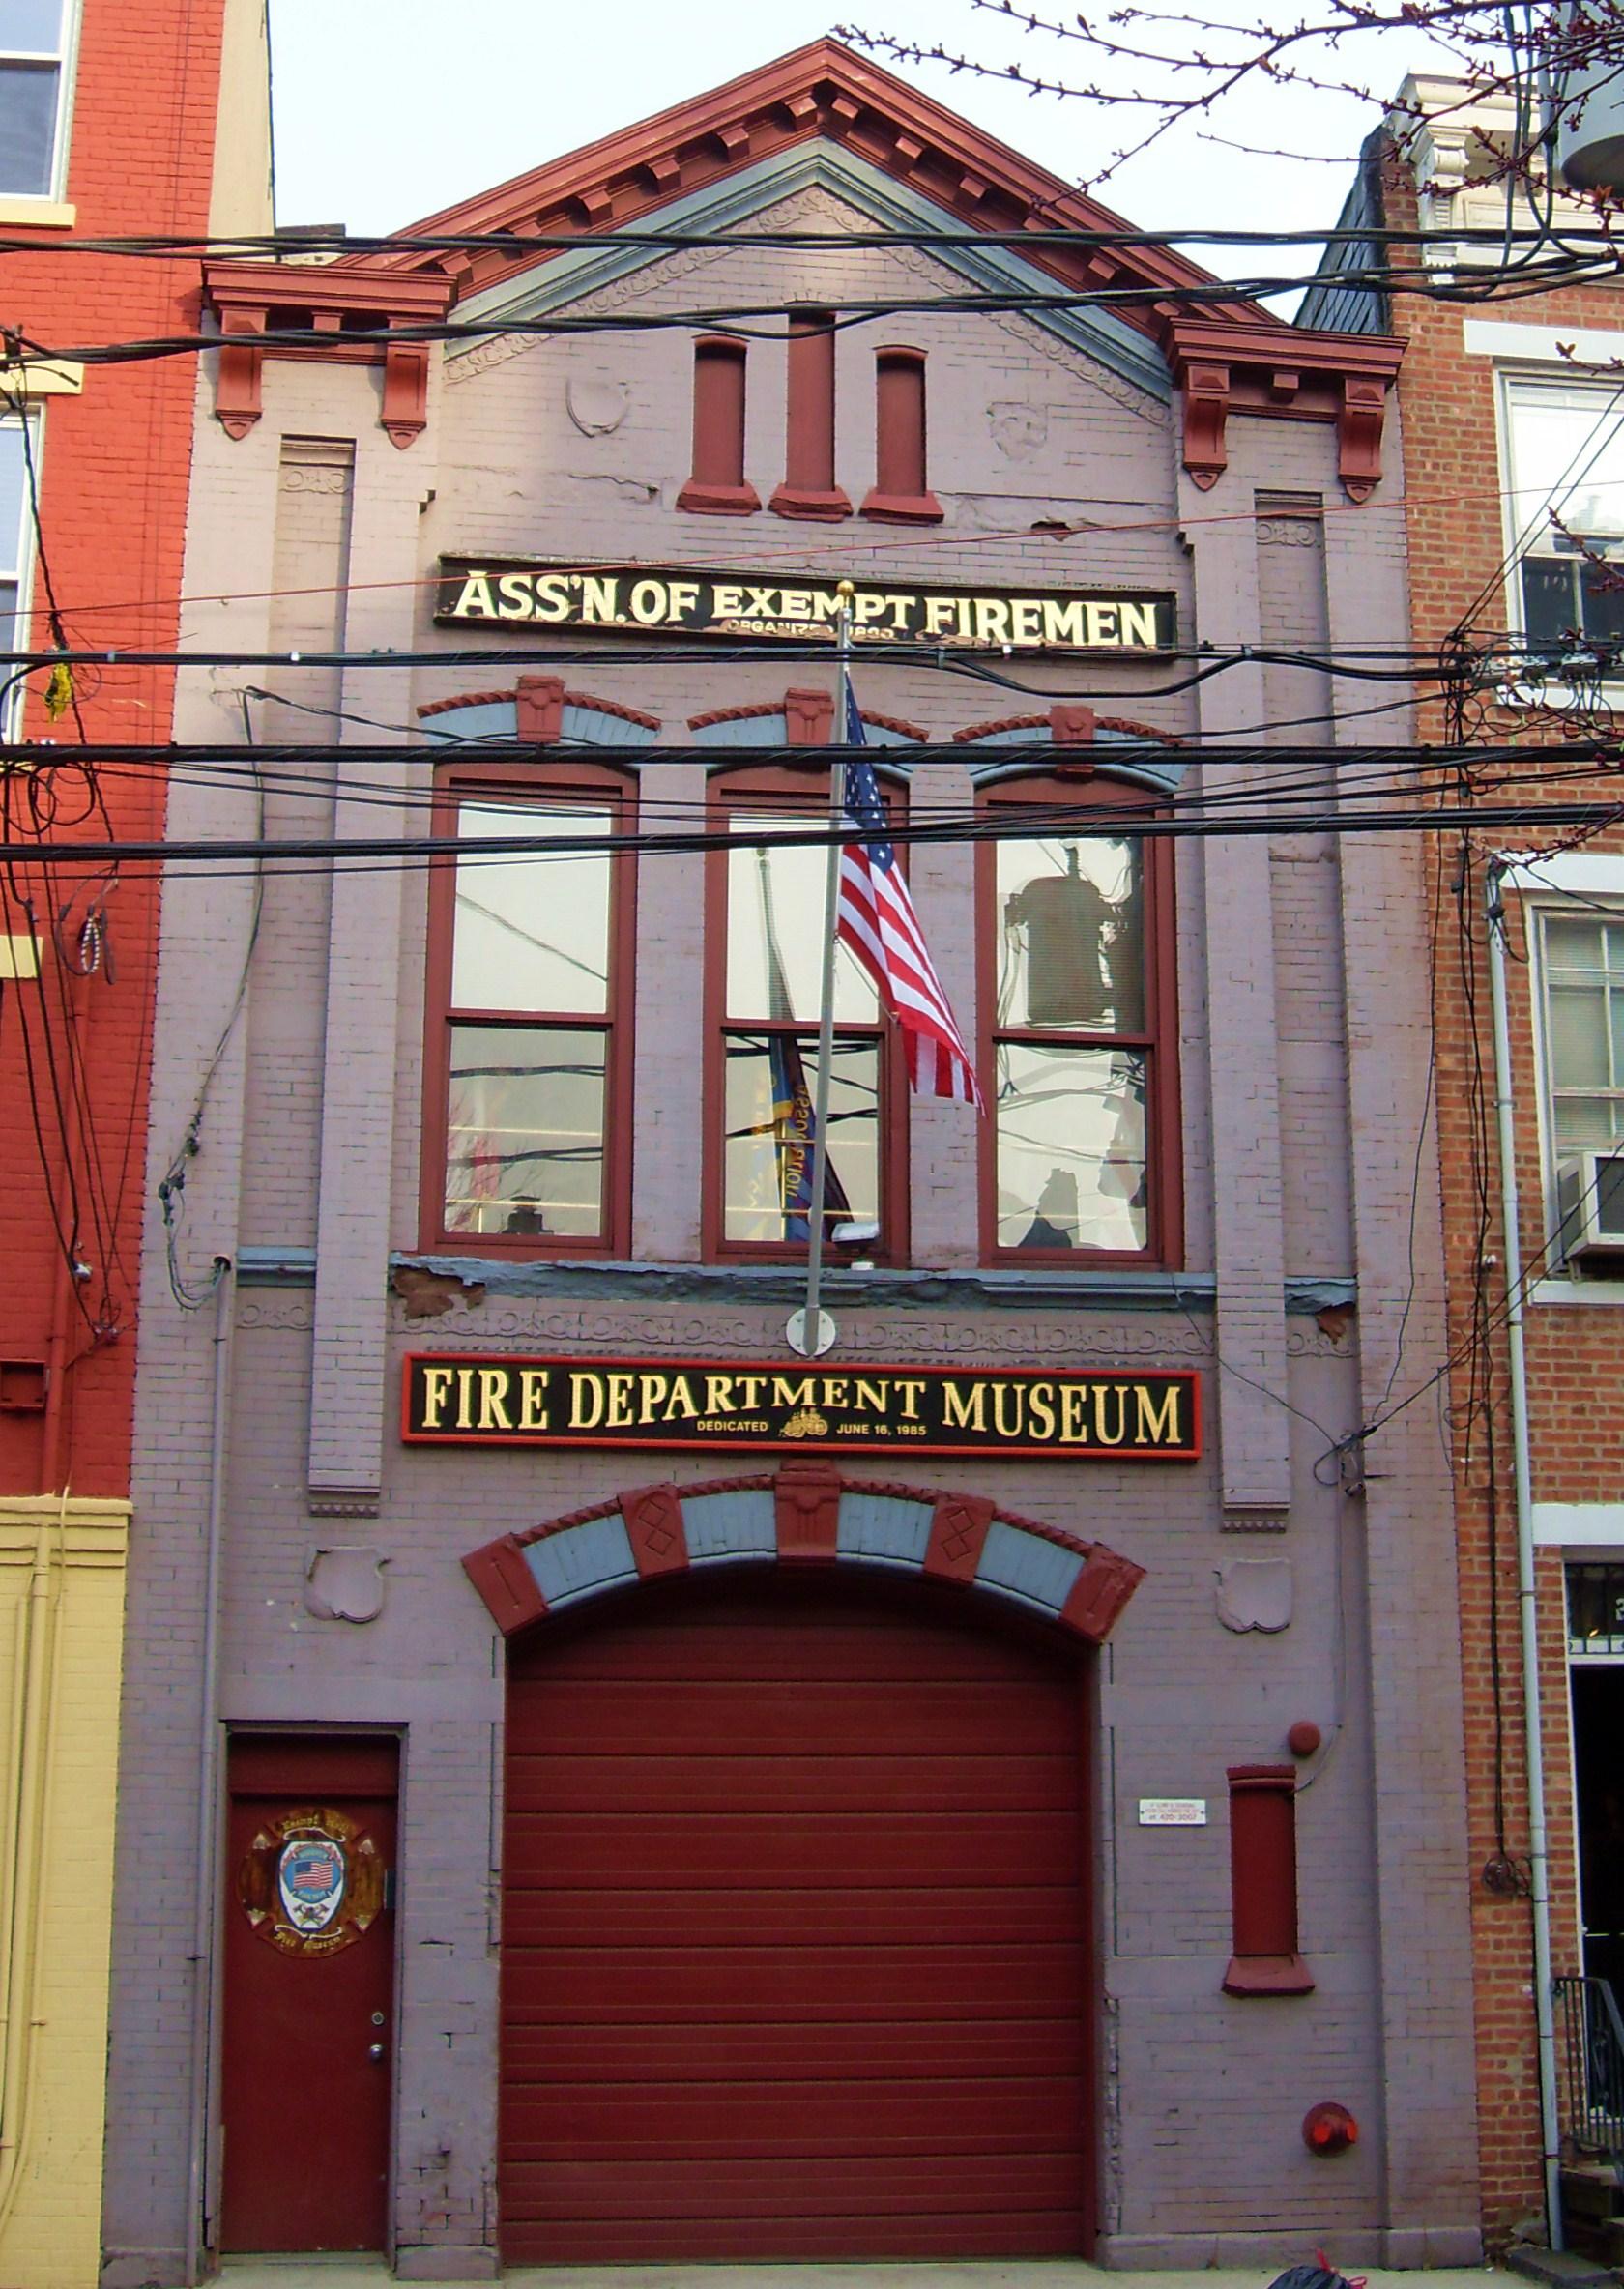 Association of Exempt Firemen Building